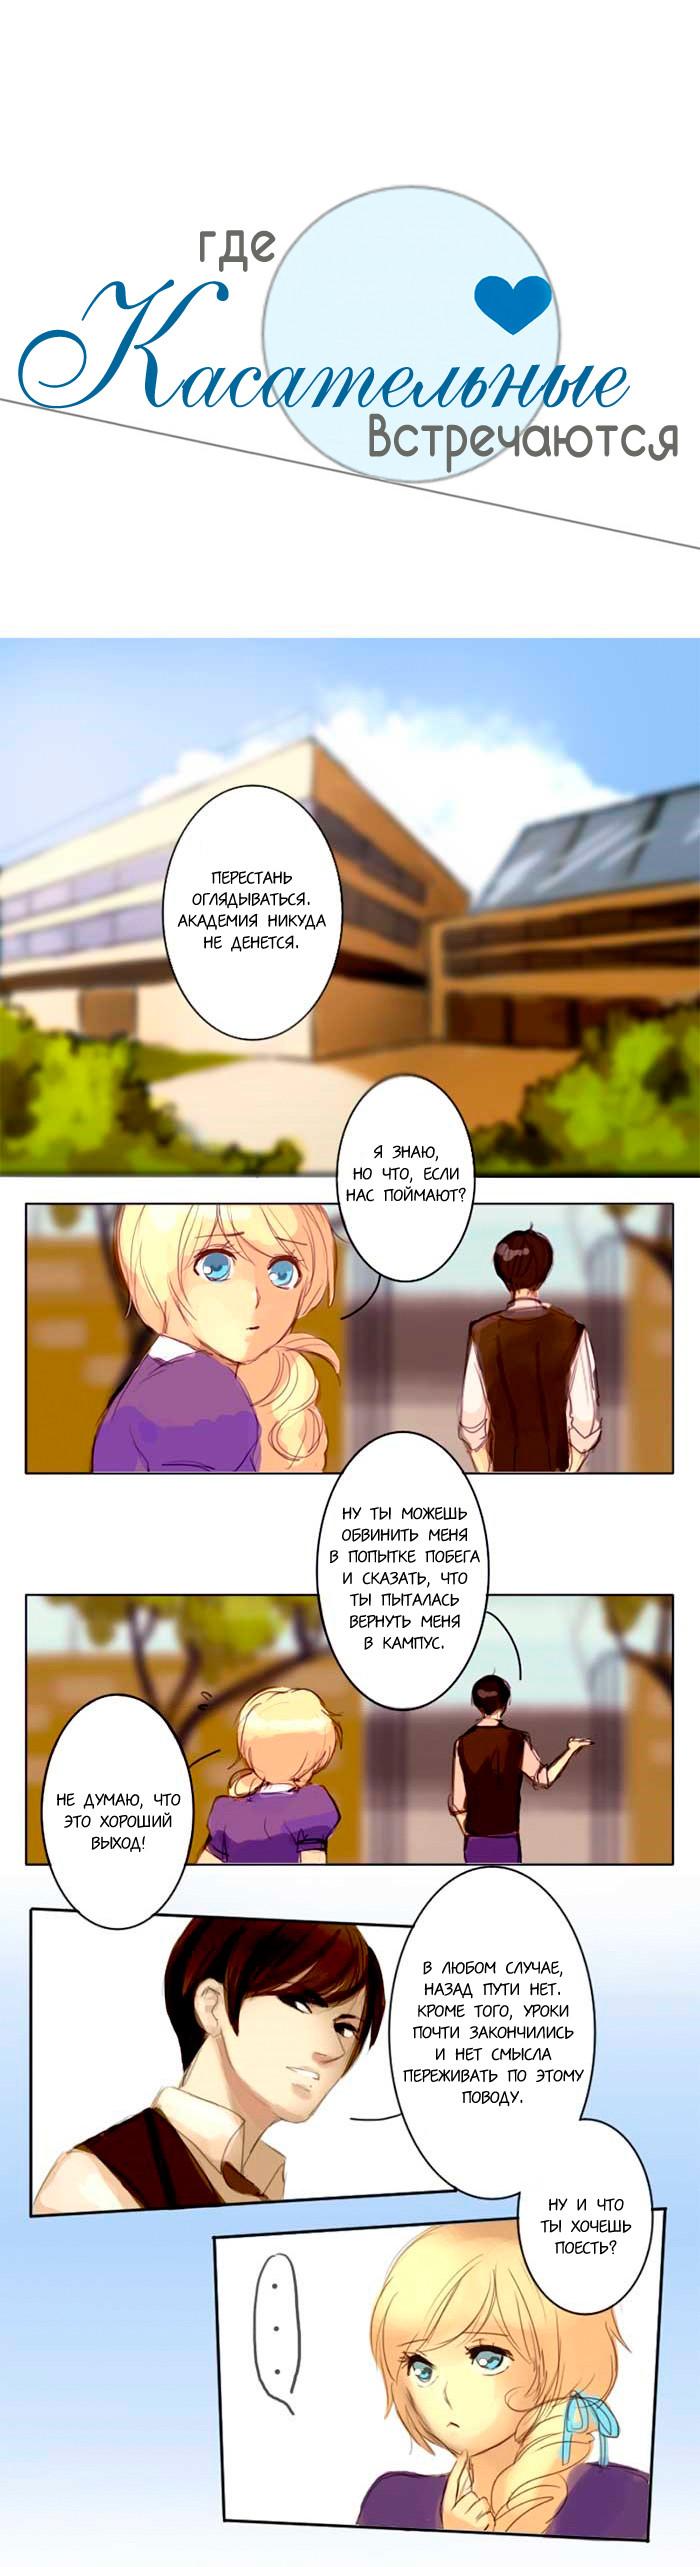 https://r1.ninemanga.com/comics/pic2/21/22485/241937/1431269181555.jpg Page 1